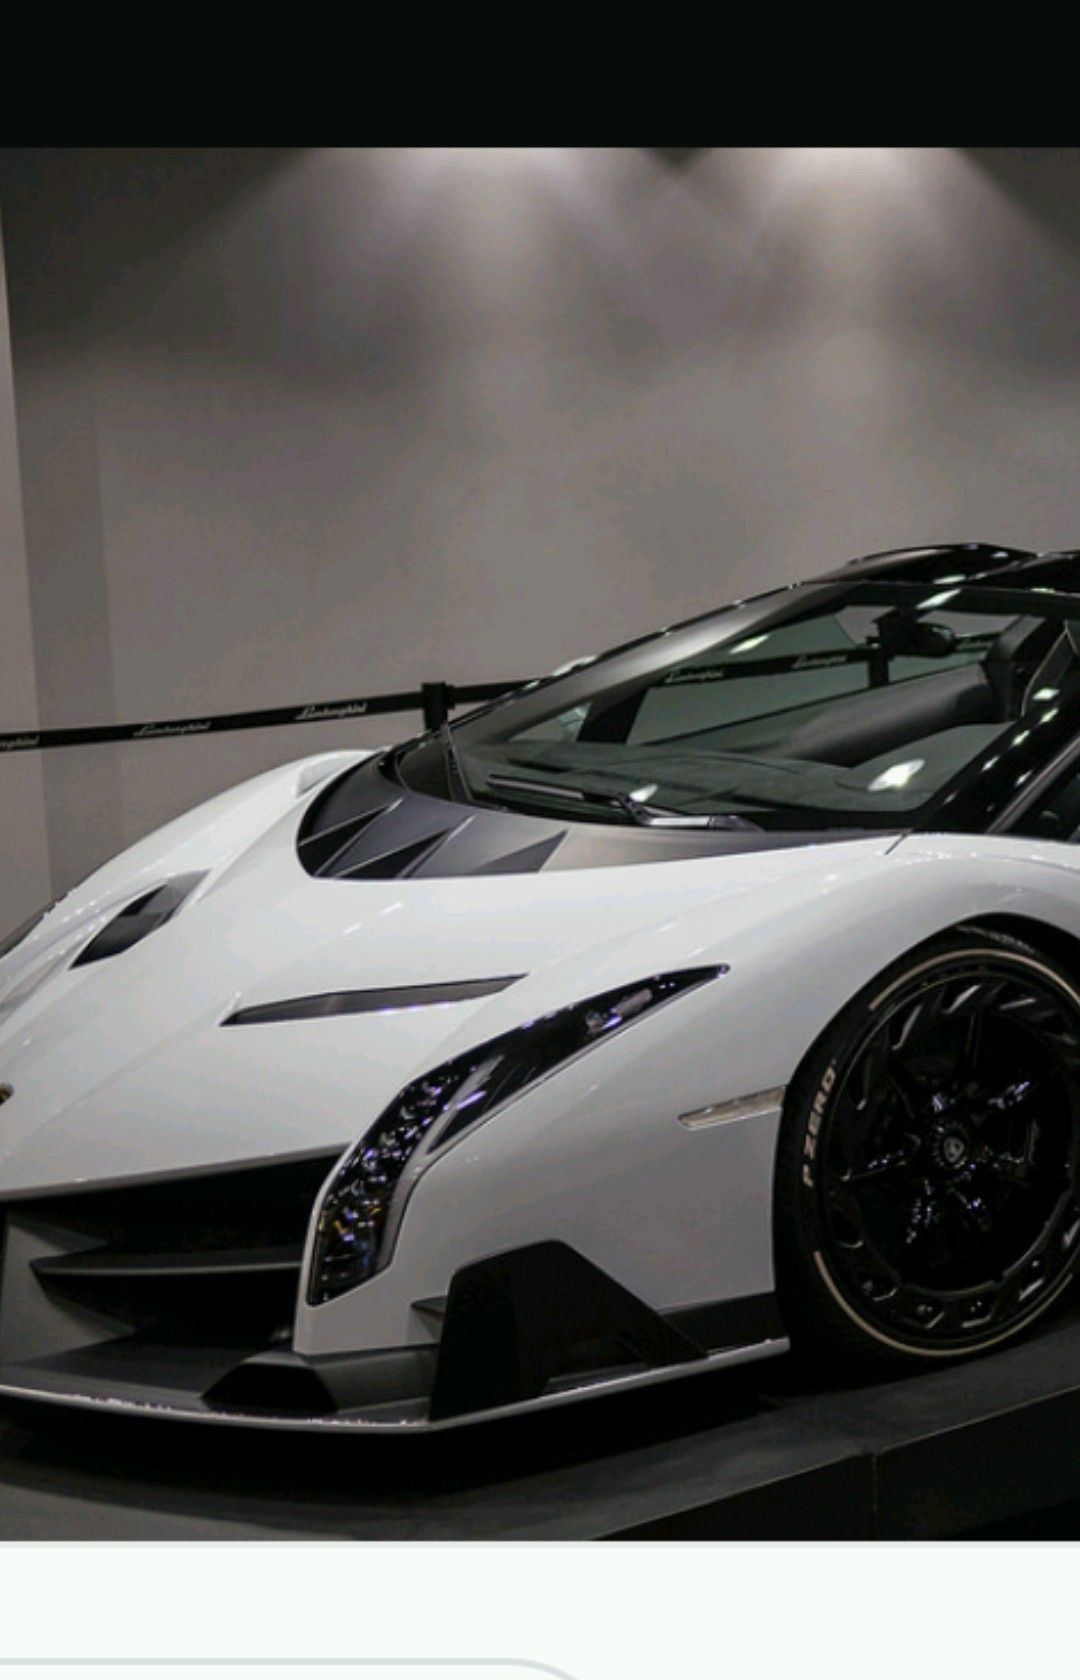 Lamborghini Veneno Roadster Prijs – Car Wallpaper 4k #lamborghiniveneno – zaza23…